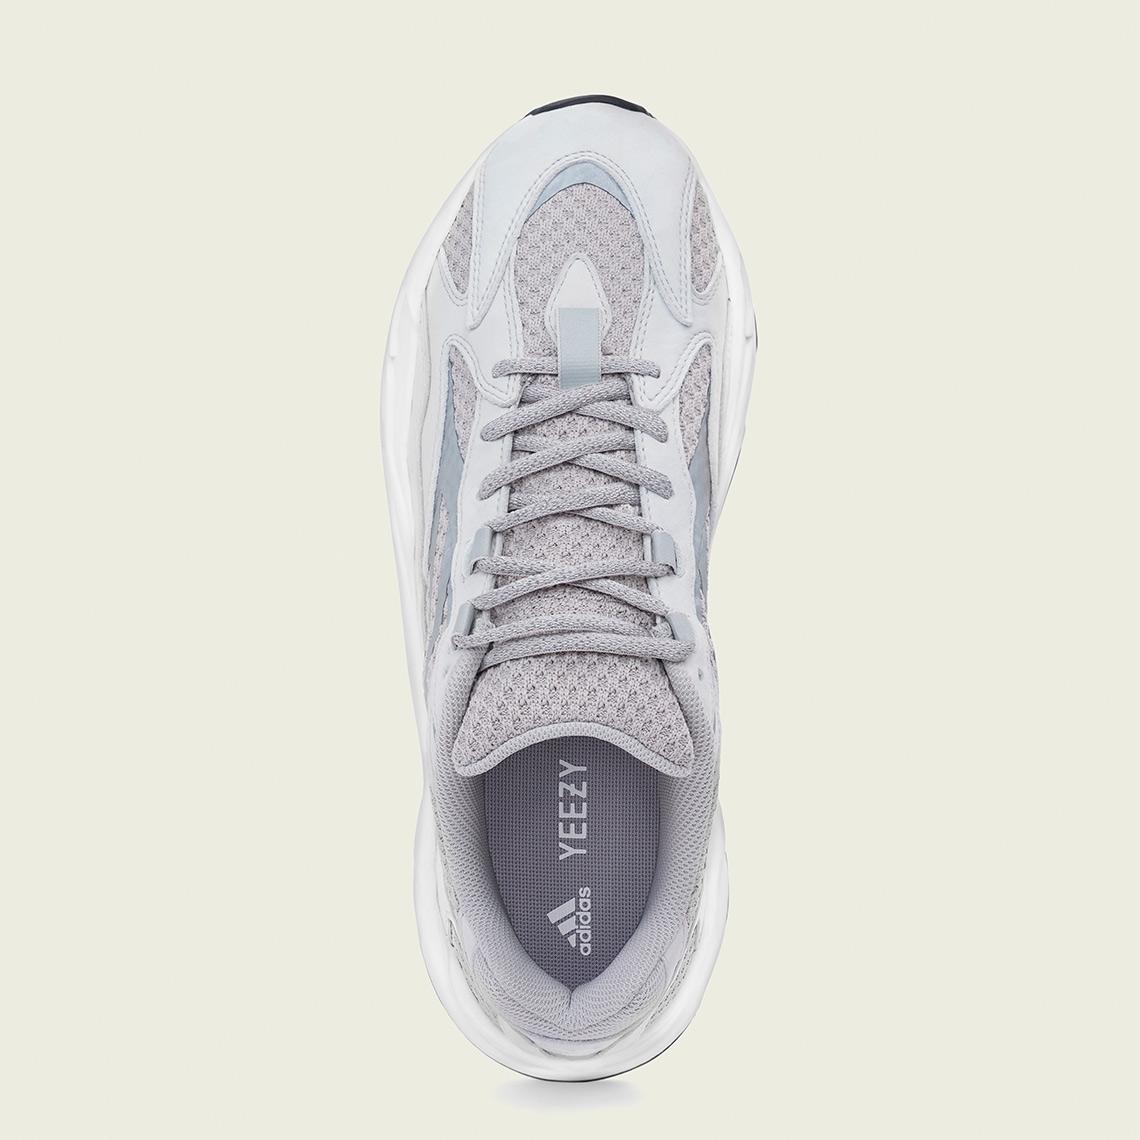 734da7d36 adidas Yeezy Boost 700 v2 Static Store List